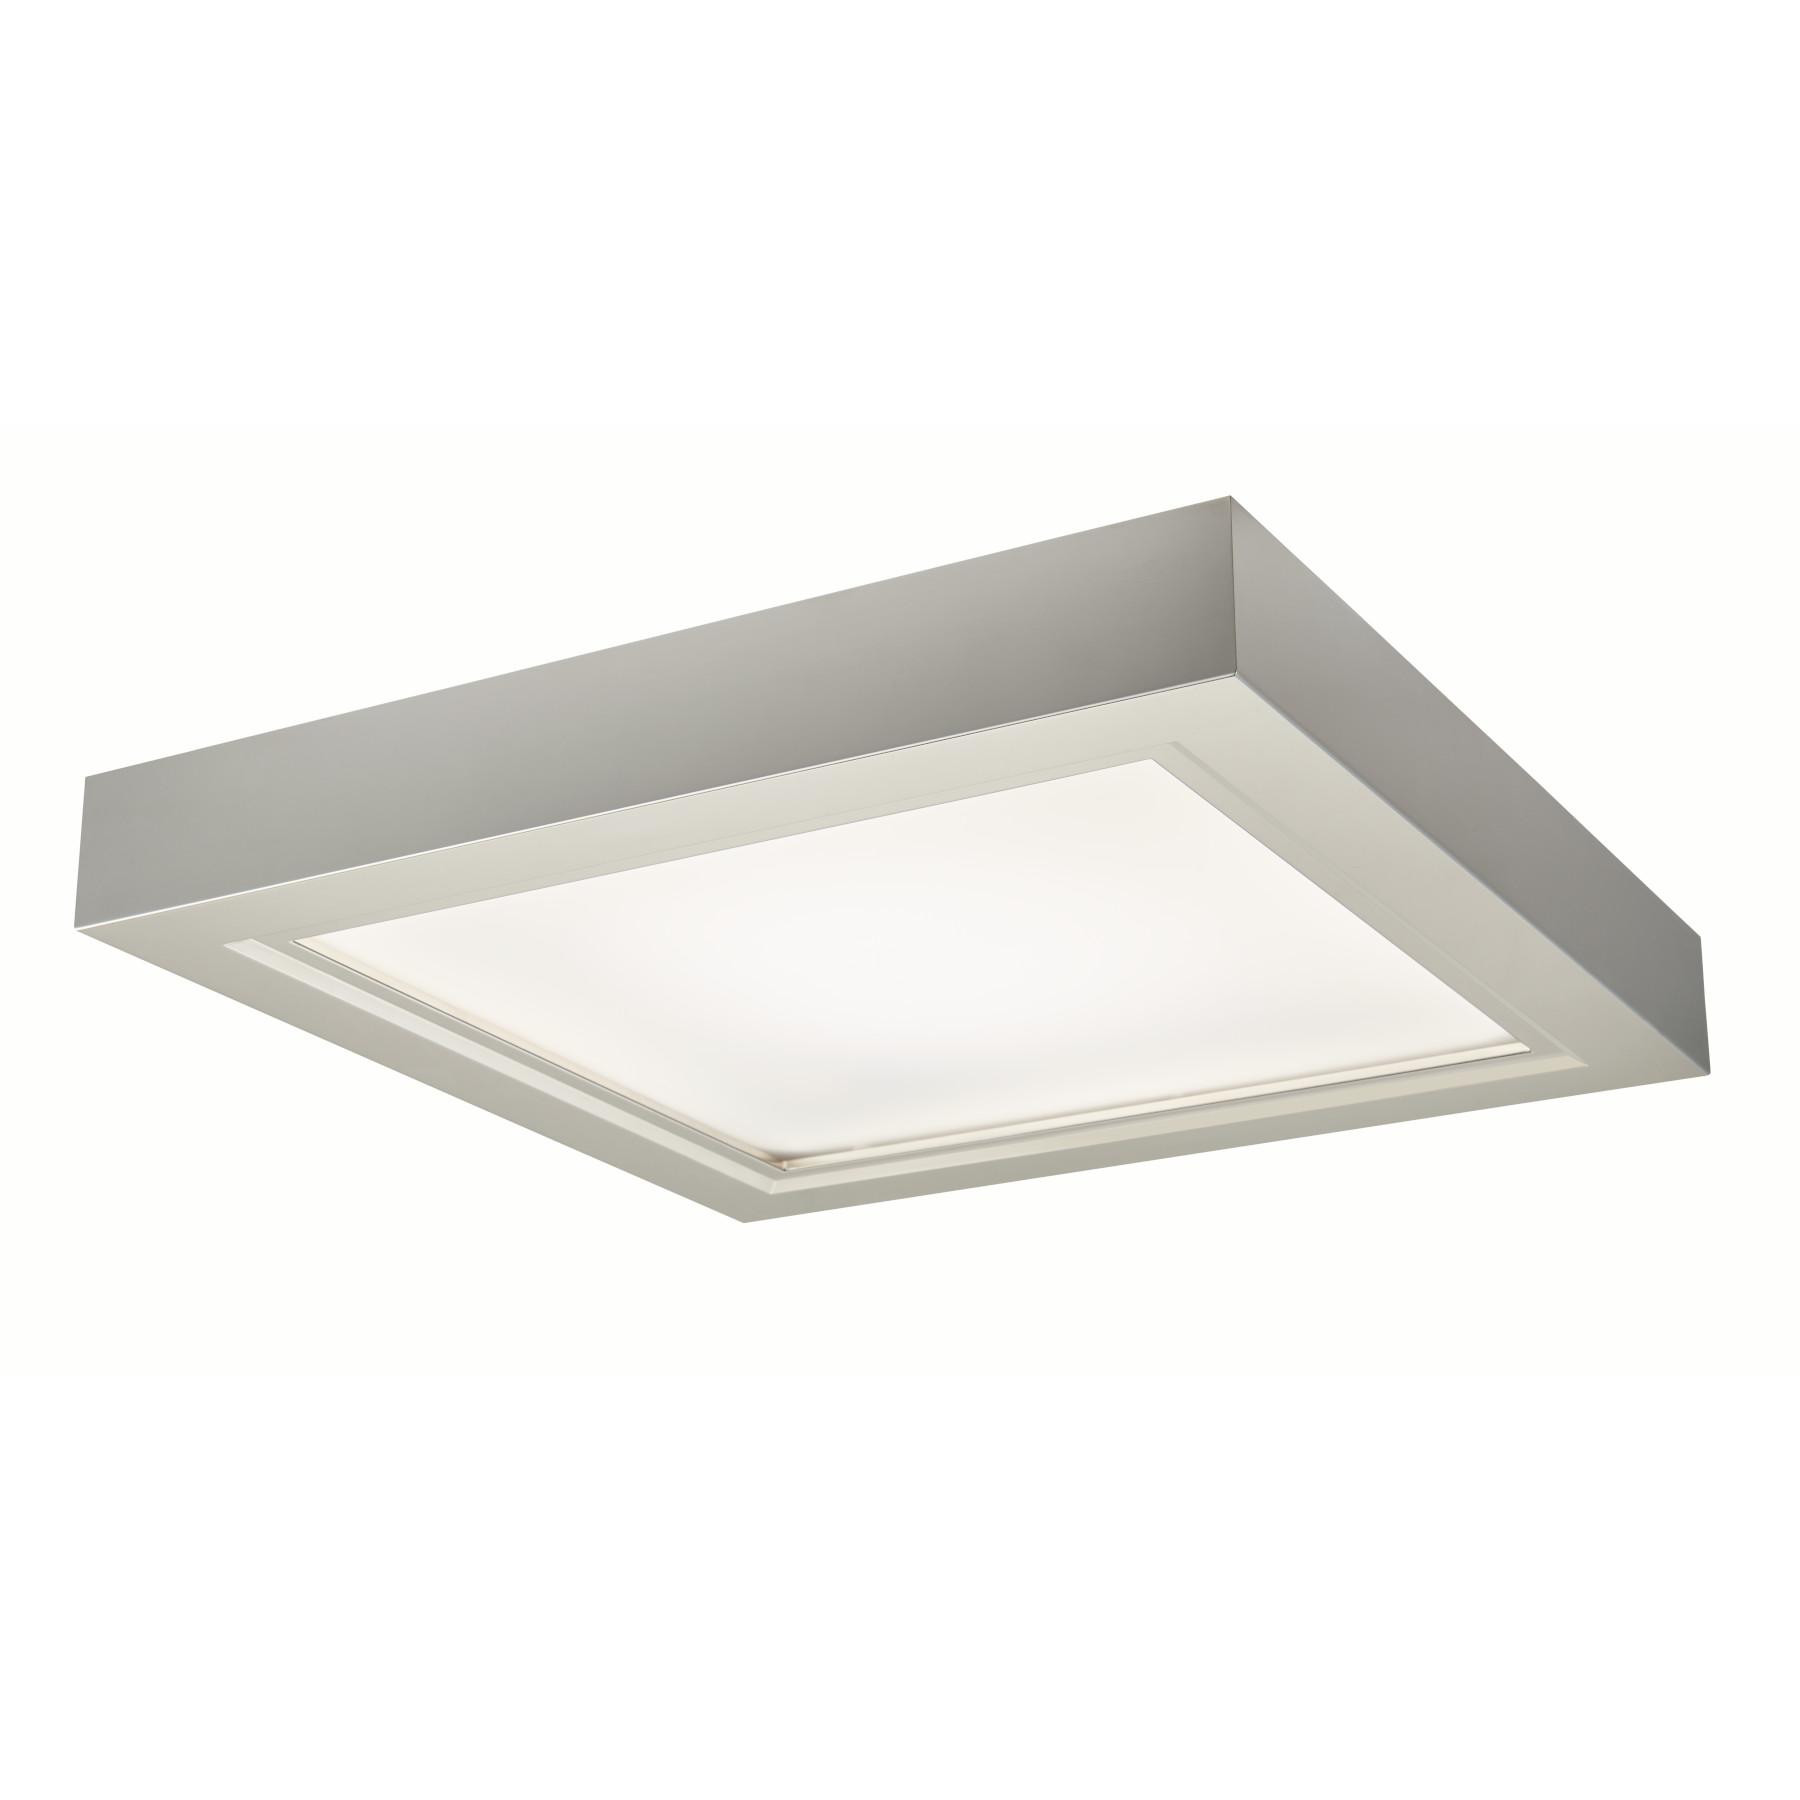 Broan® Ventilateur décoratif de 110 pi³/min, 1,5 sone